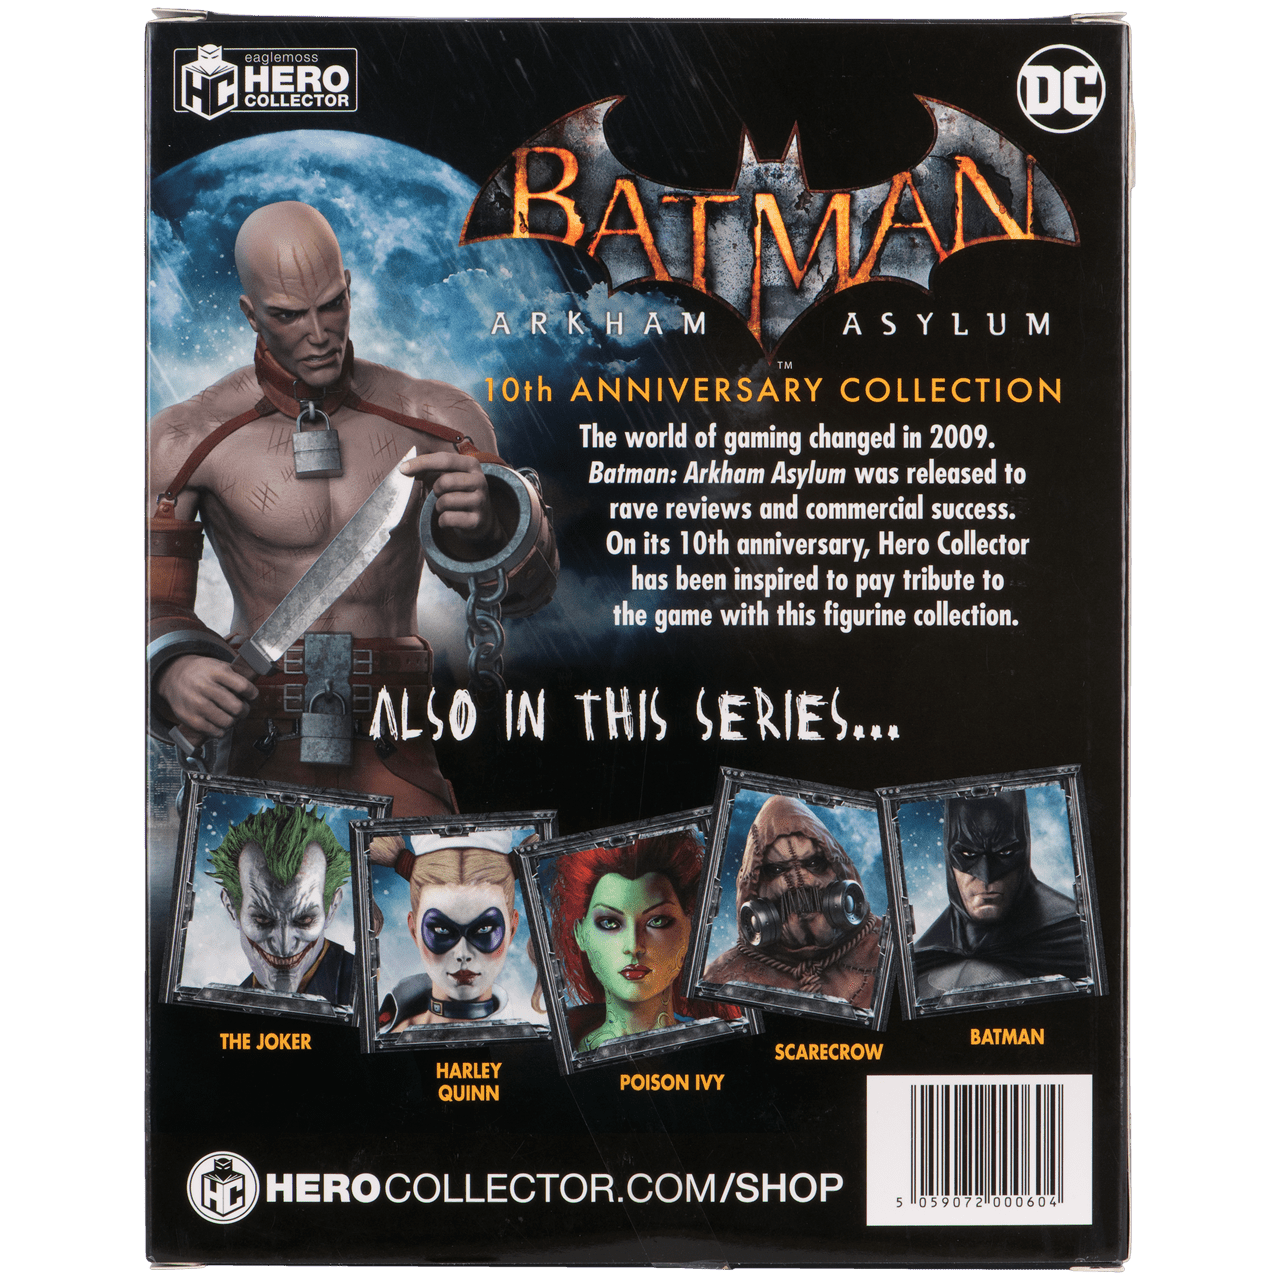 Zsasz Batman Arkham Asylum 1:16 Figurine With Magazine: Hero Collector - 2